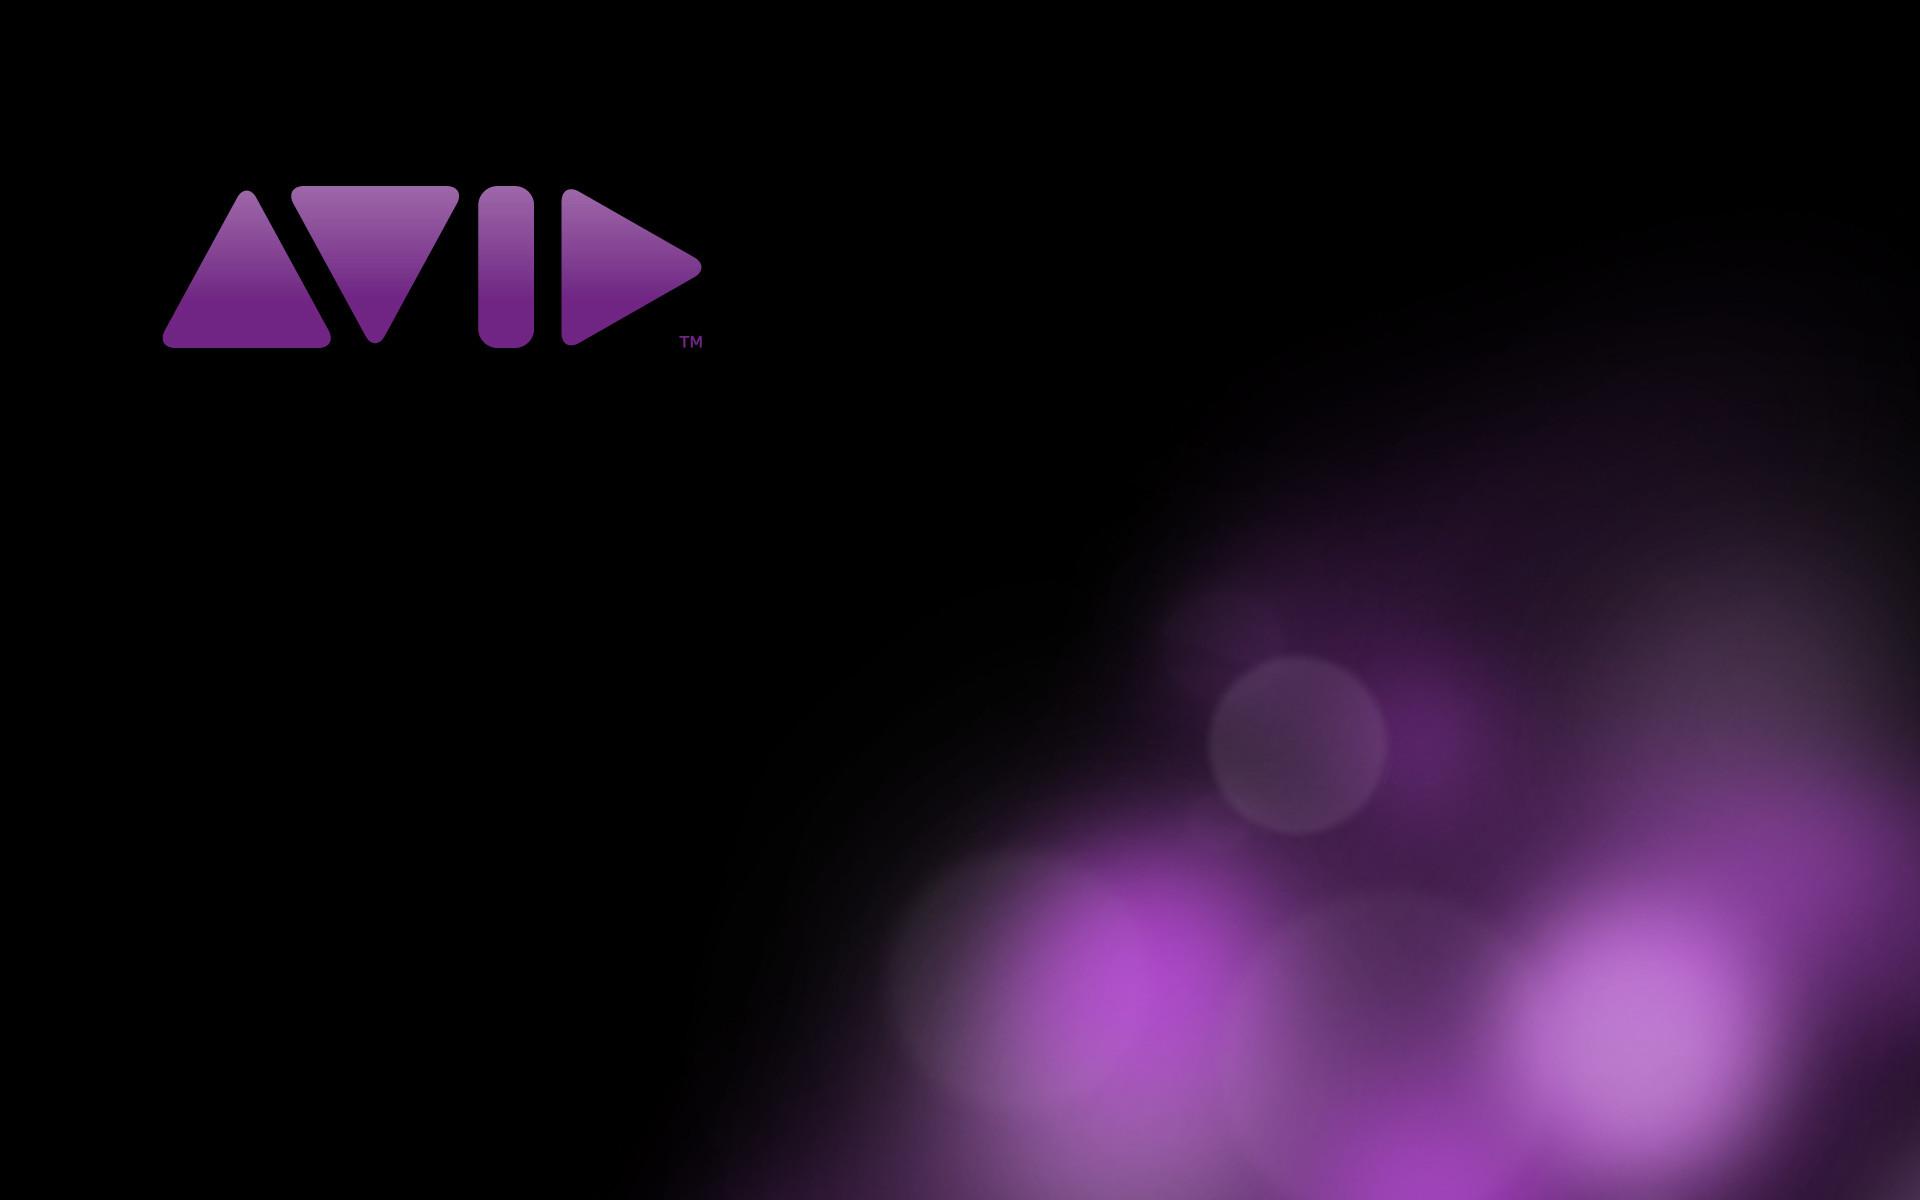 Res: 1920x1200, Download desktop wallpaper for your Avid system - Avid Community